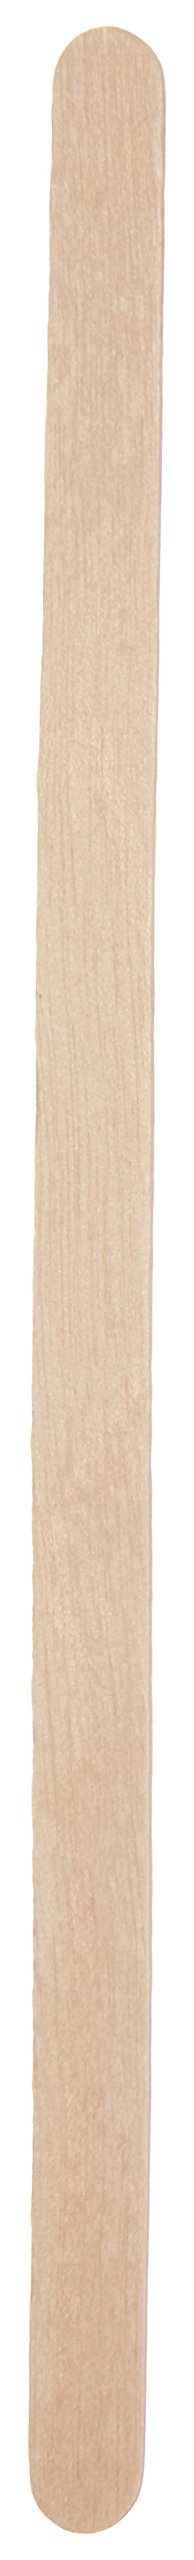 DUKAL Spa 900418 Wood Applicator Sticks, Non-Sterile, 1/4'' x 5 1/2'', Slim, Bendable (Pack of 2500)